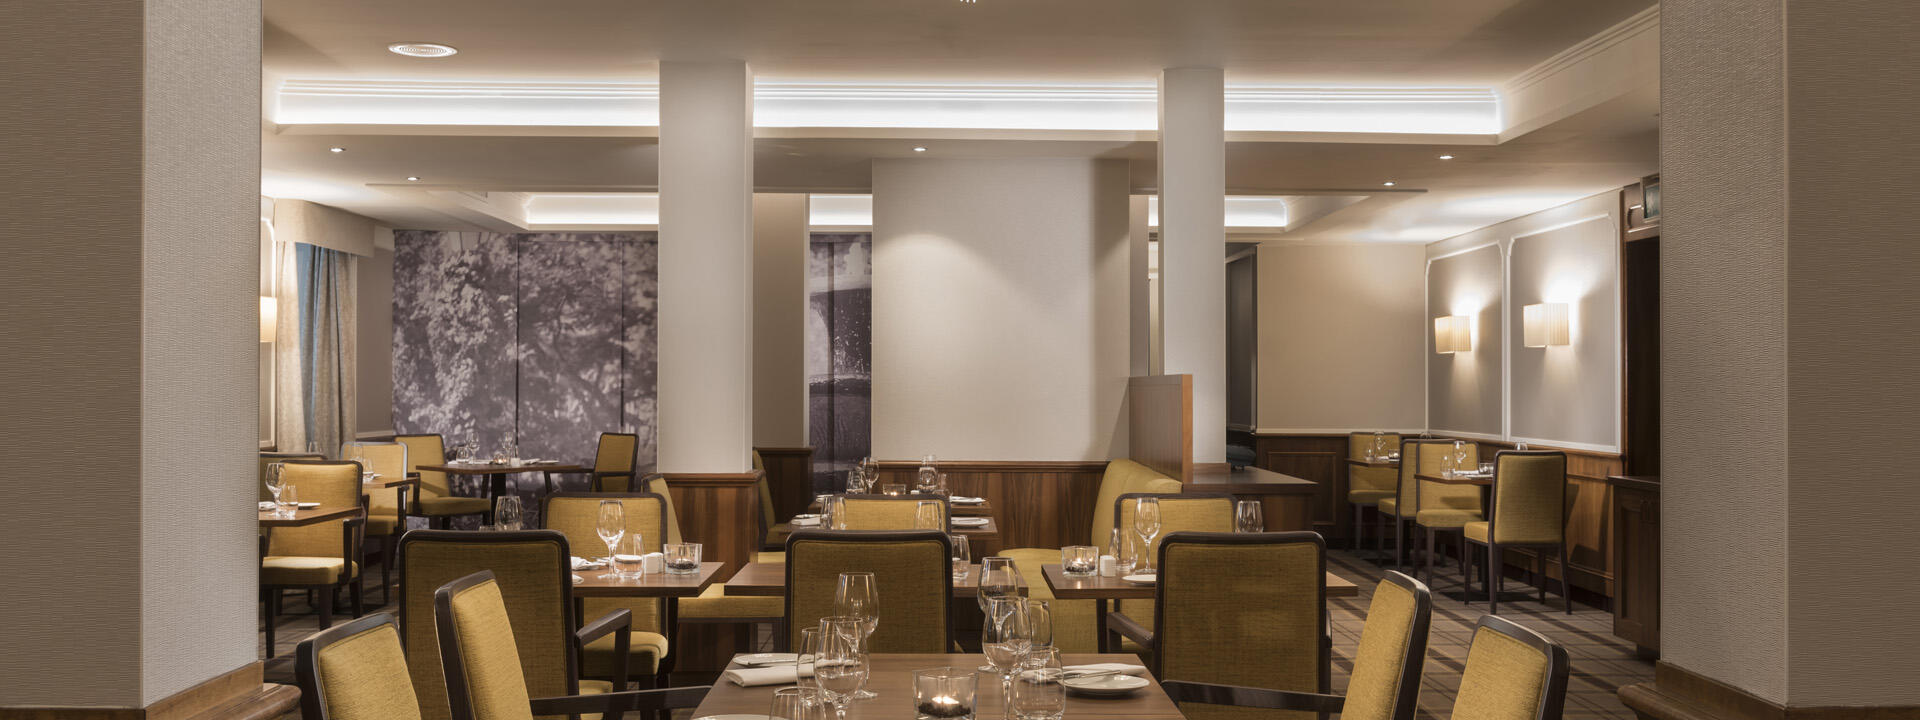 Restaurant view at Precise Resort Baden Baden